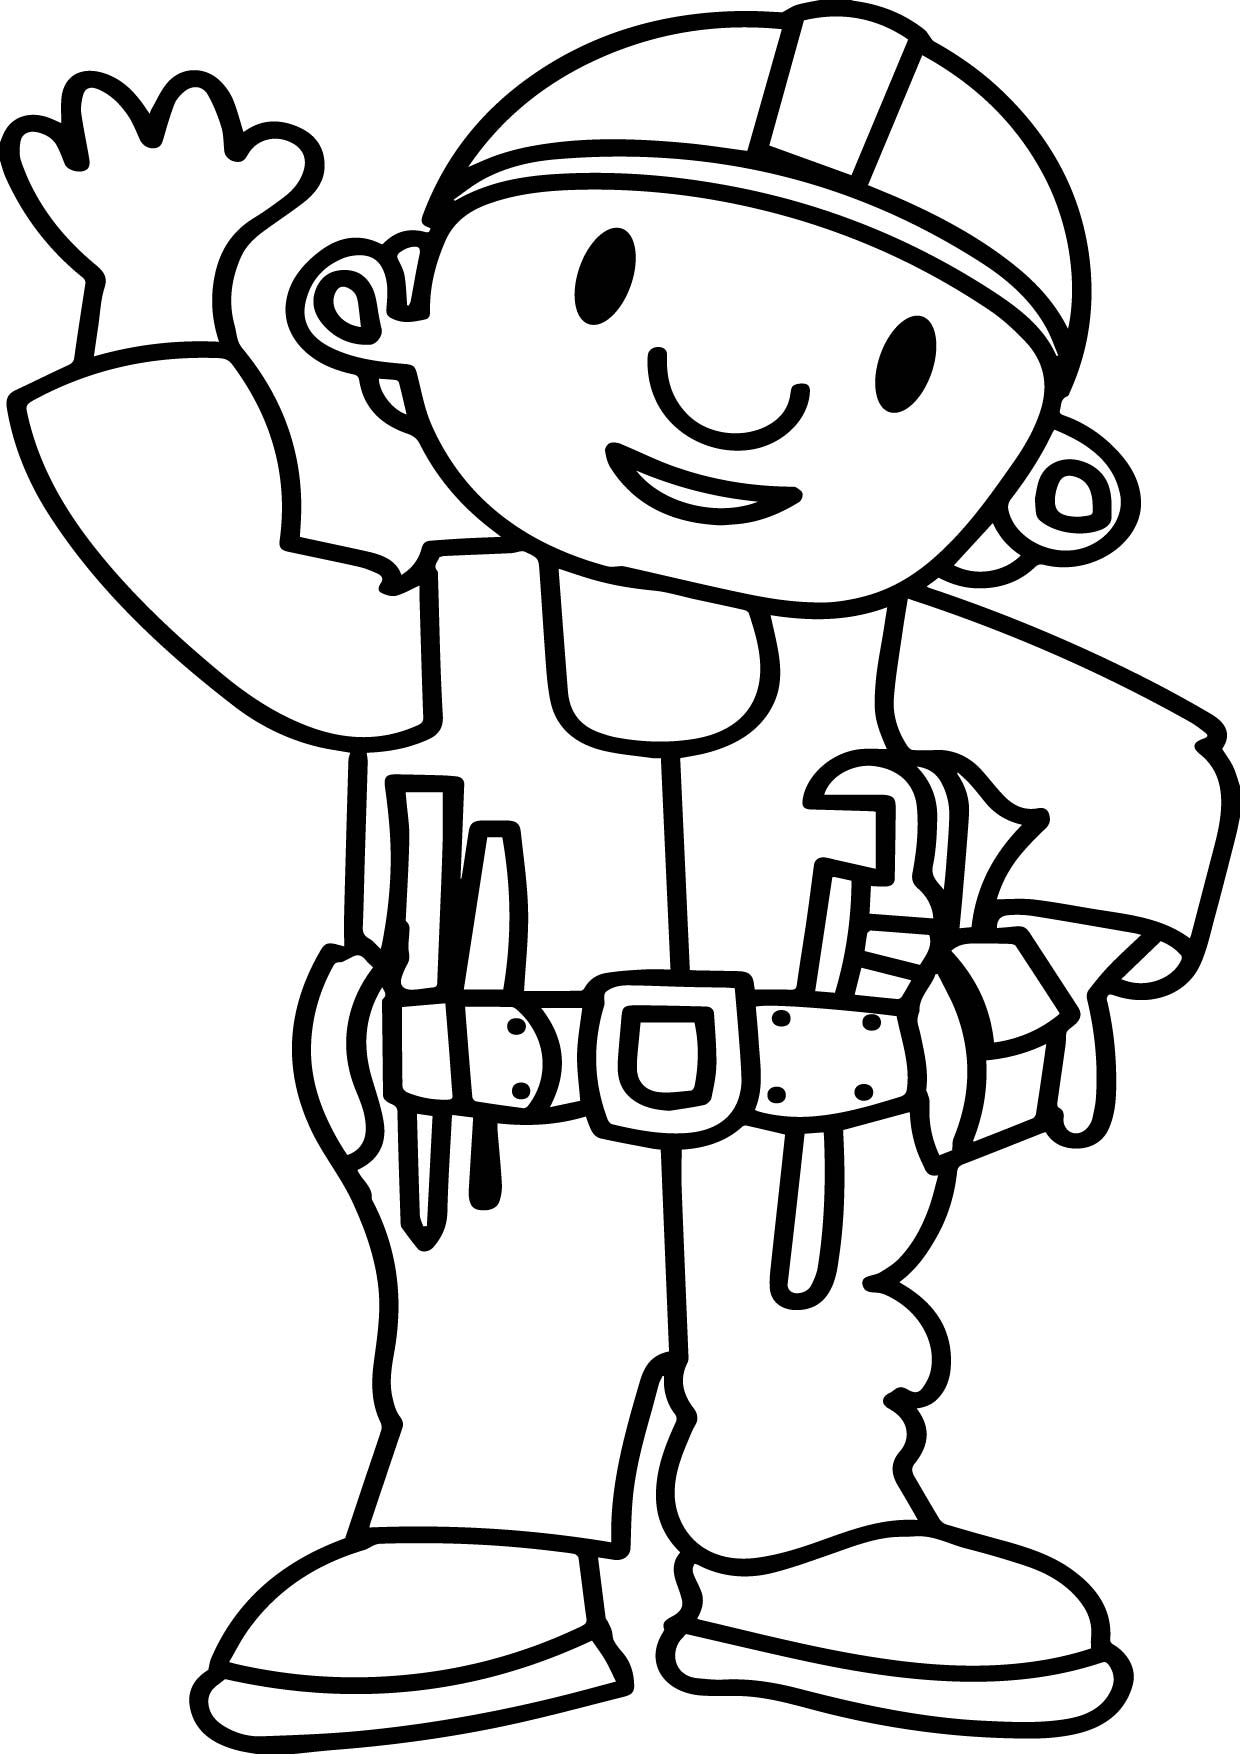 Bob The Builder Hello Coloring Page